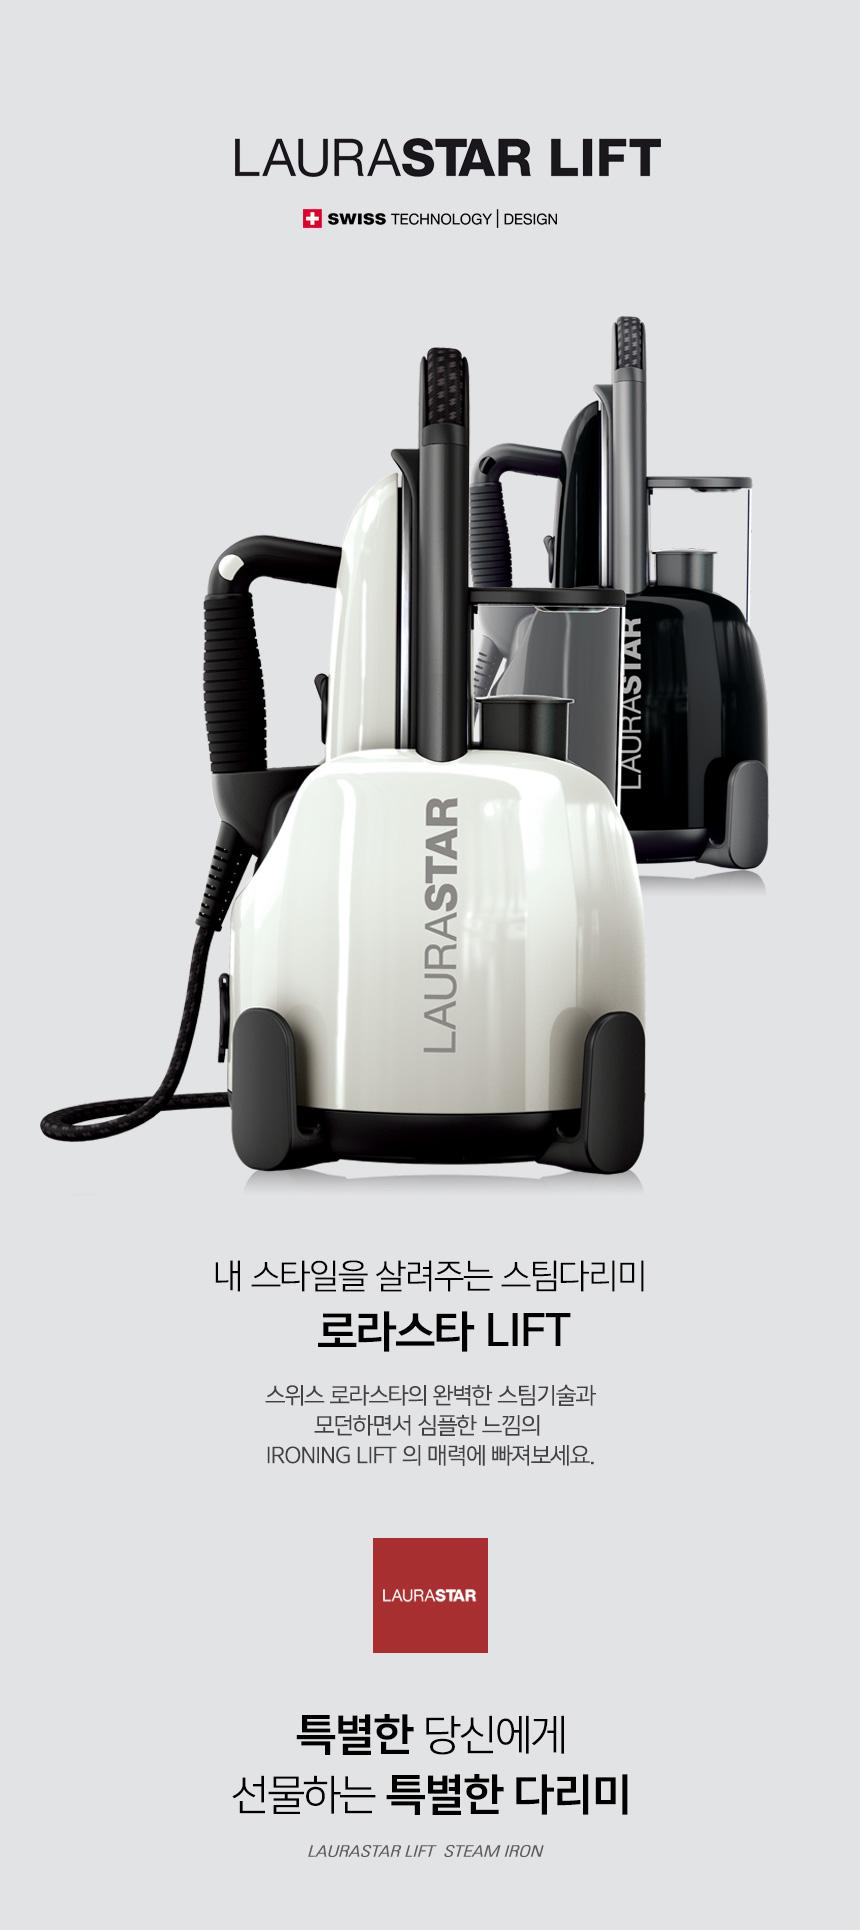 lift_02.jpg